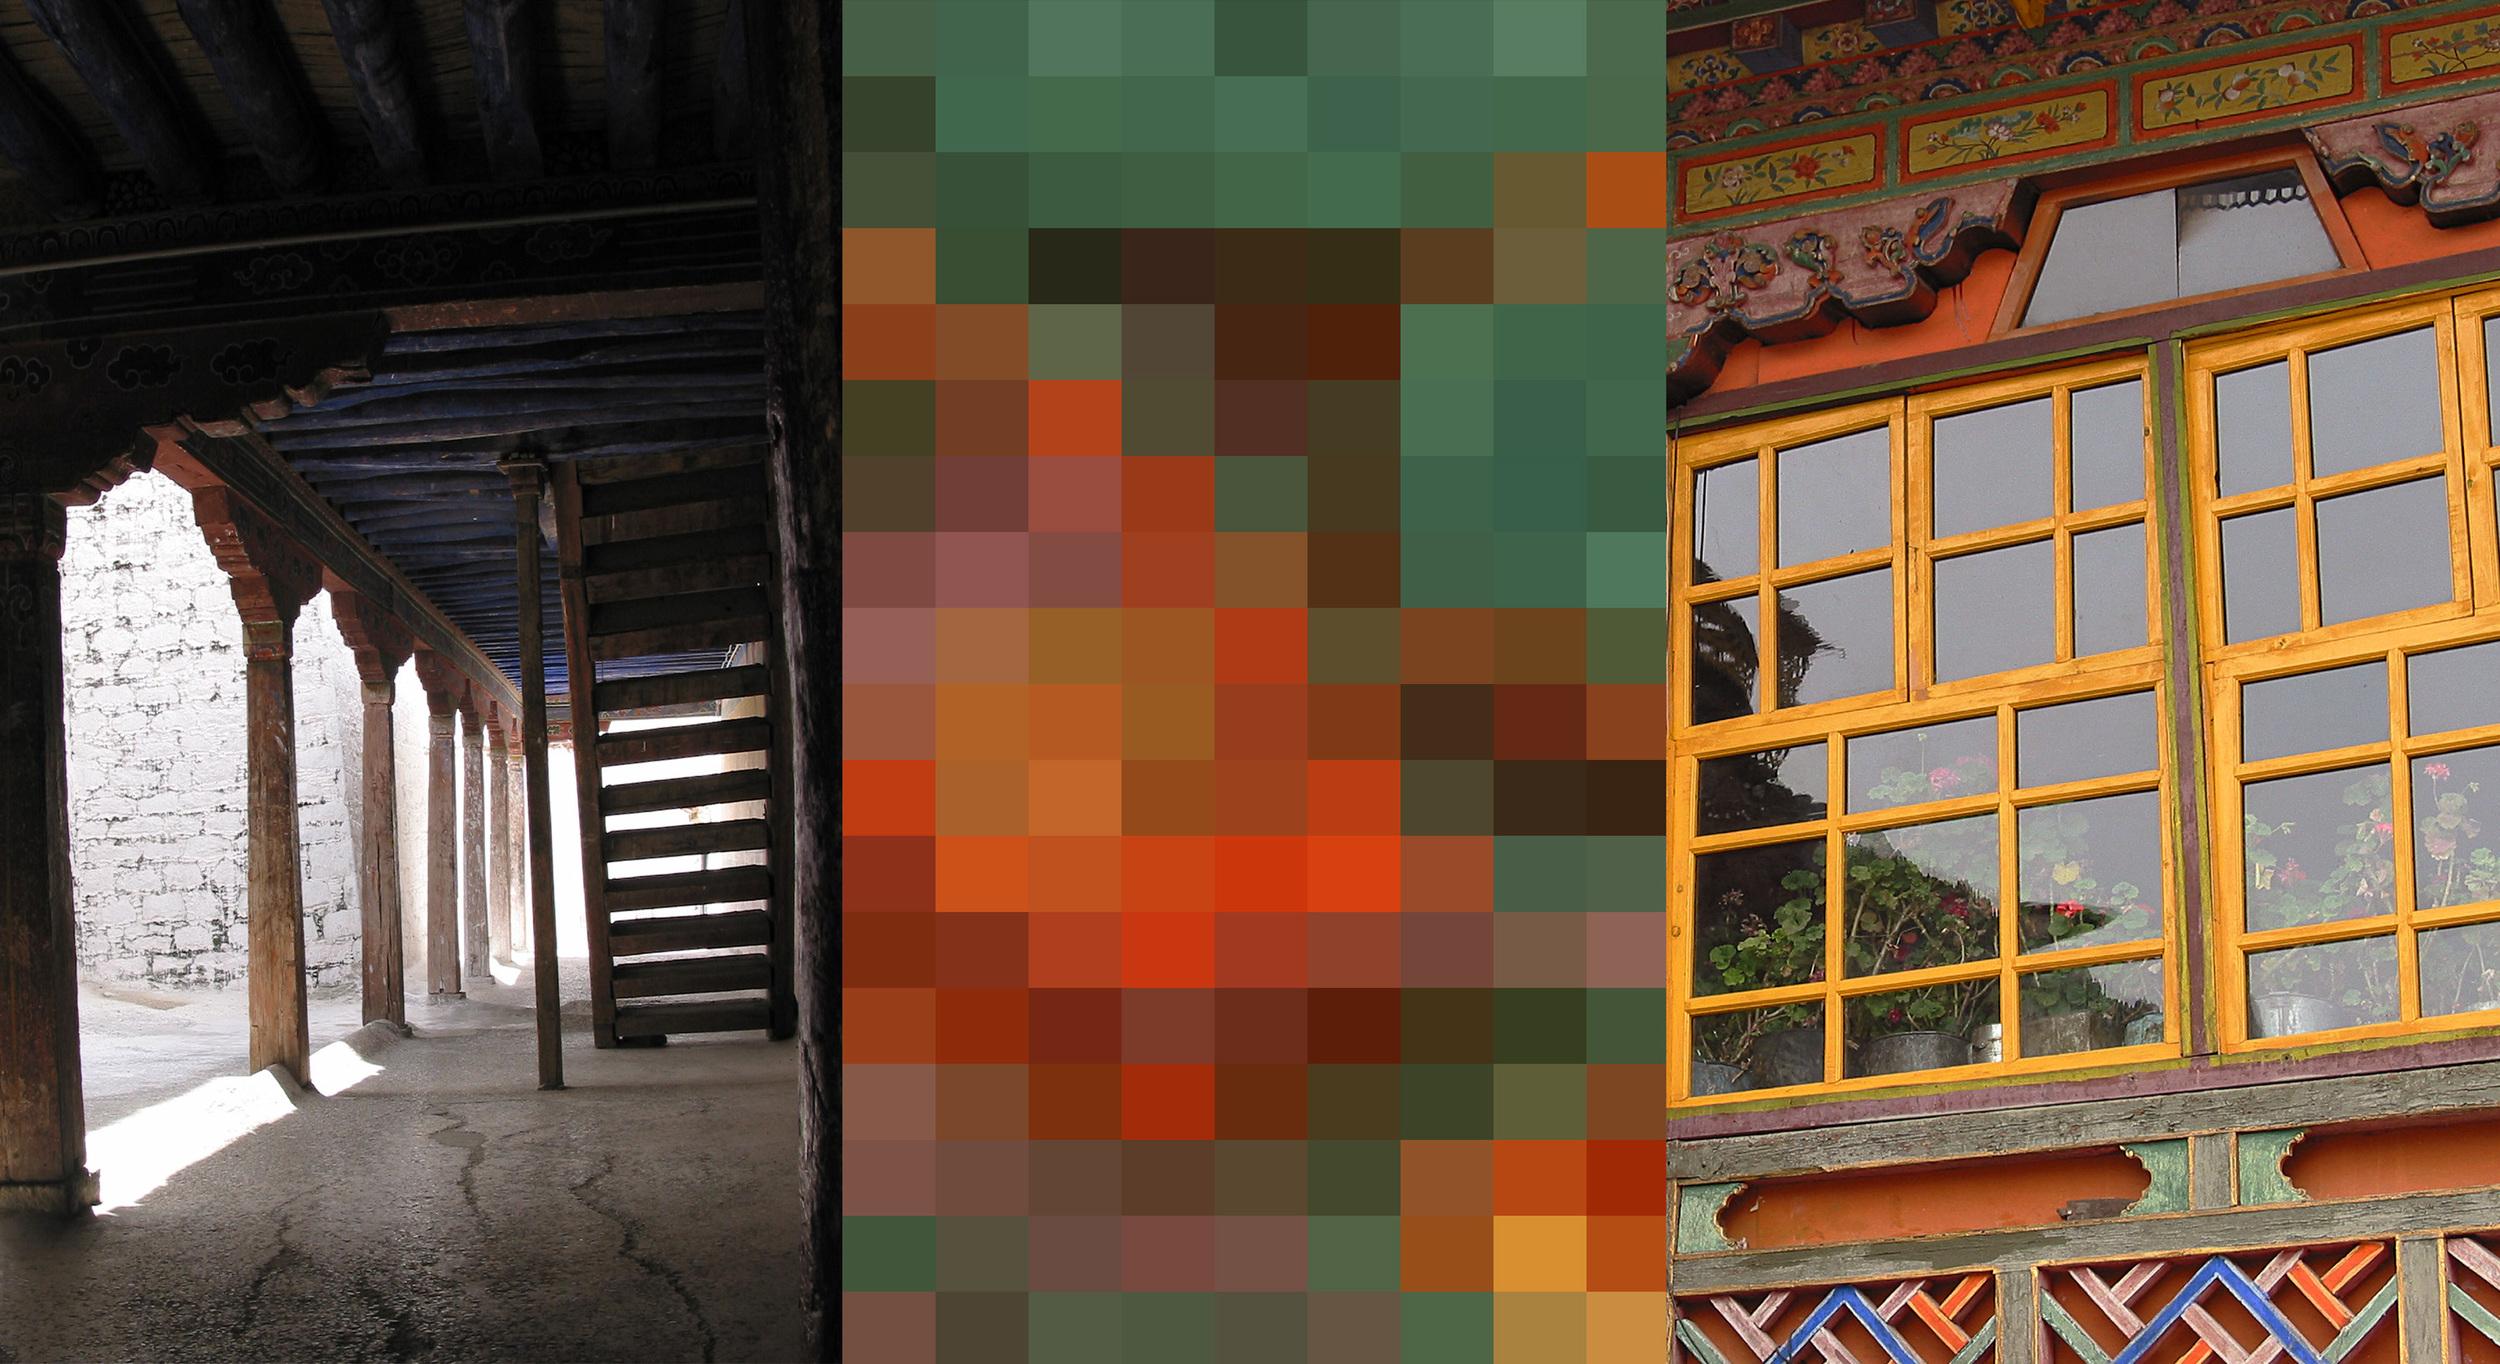 stairs-window fin-1.jpg